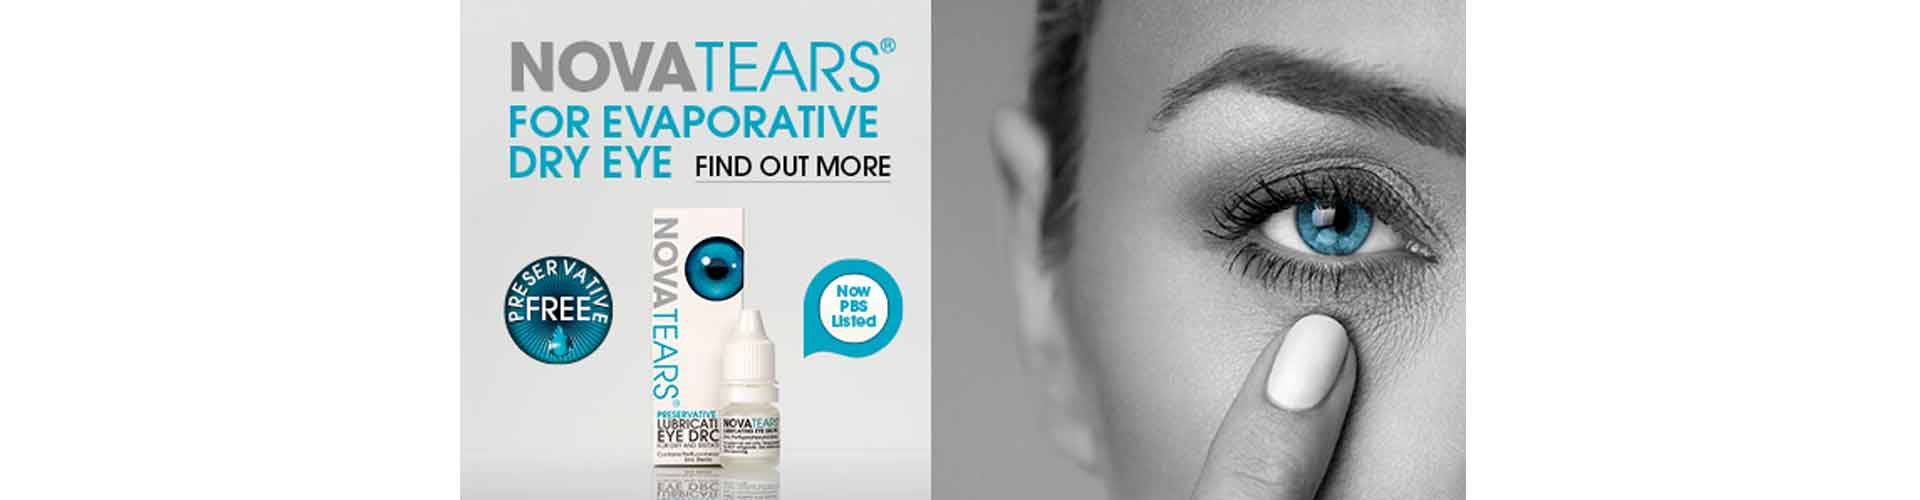 healthSAVE Product Nova Tears